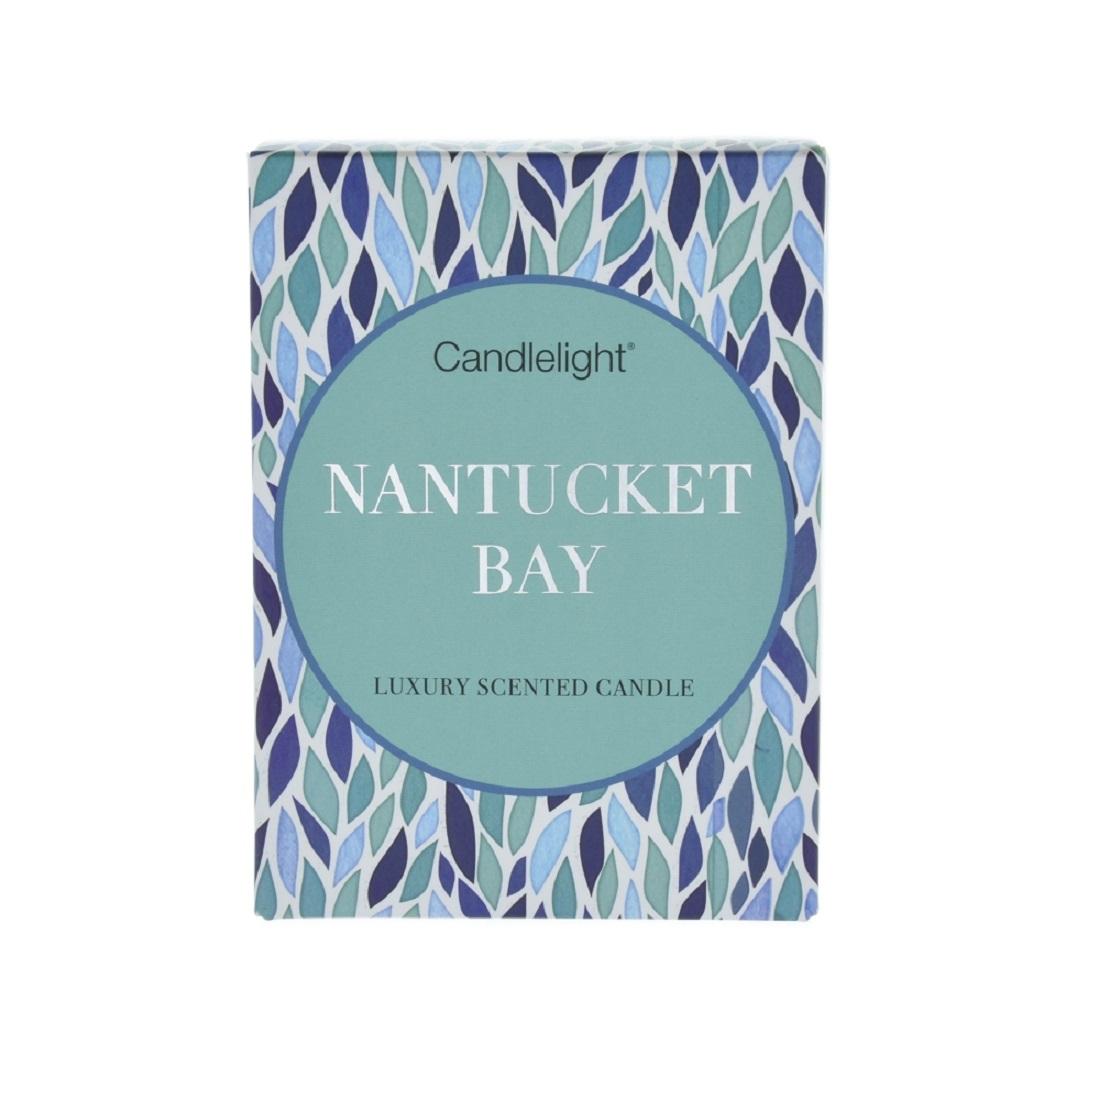 Nantucket Bay Small Candle